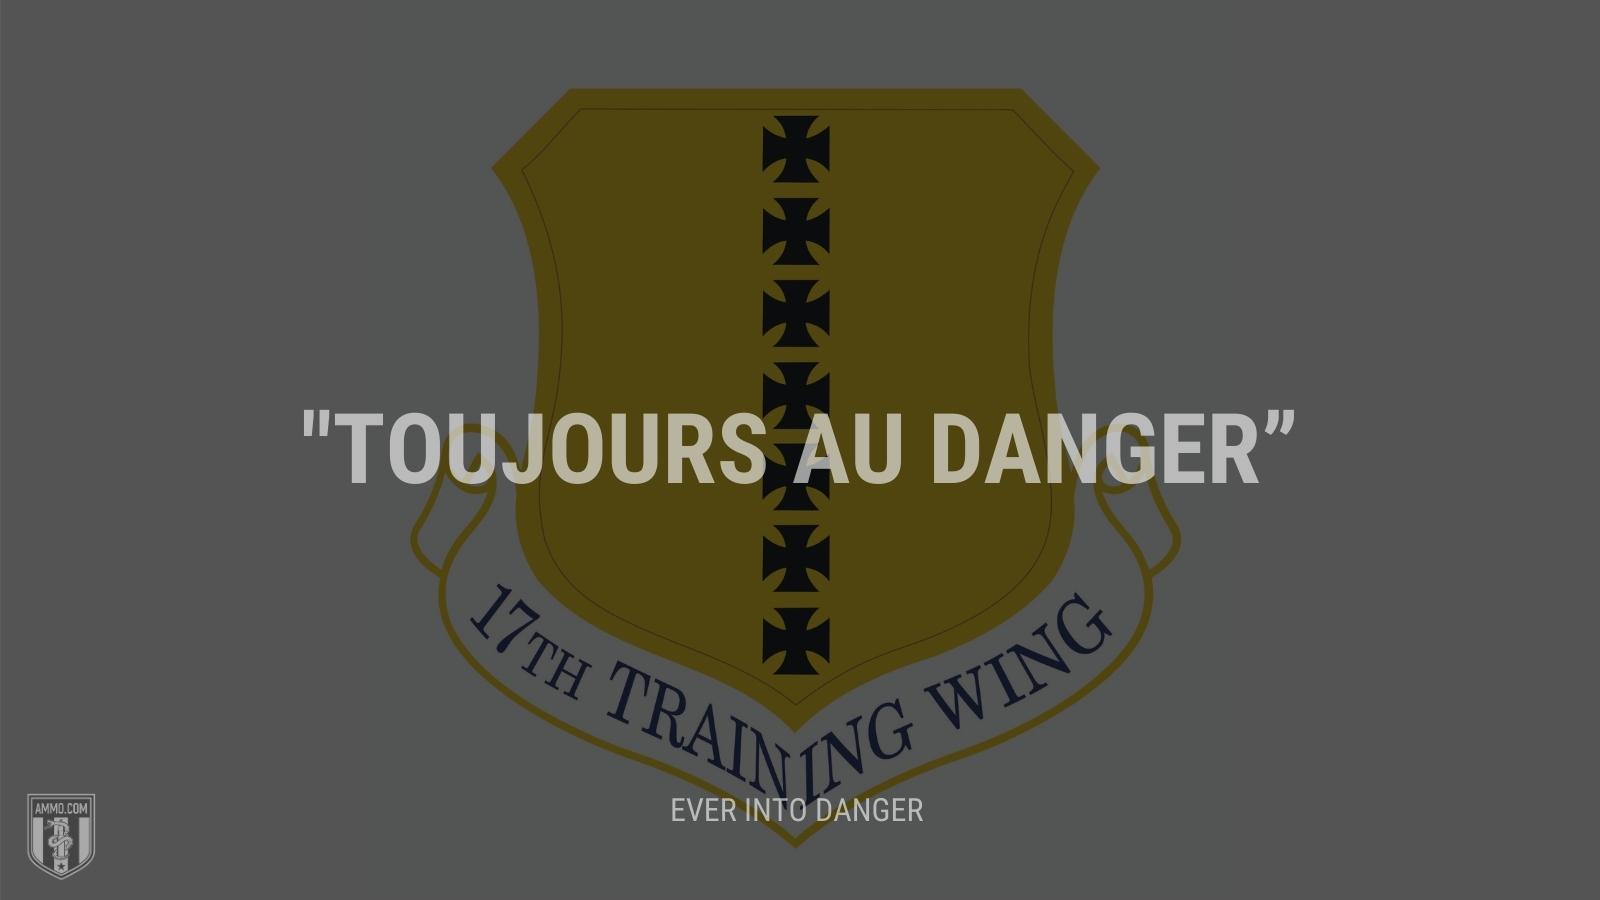 """Toujours au danger"" - Ever into danger"